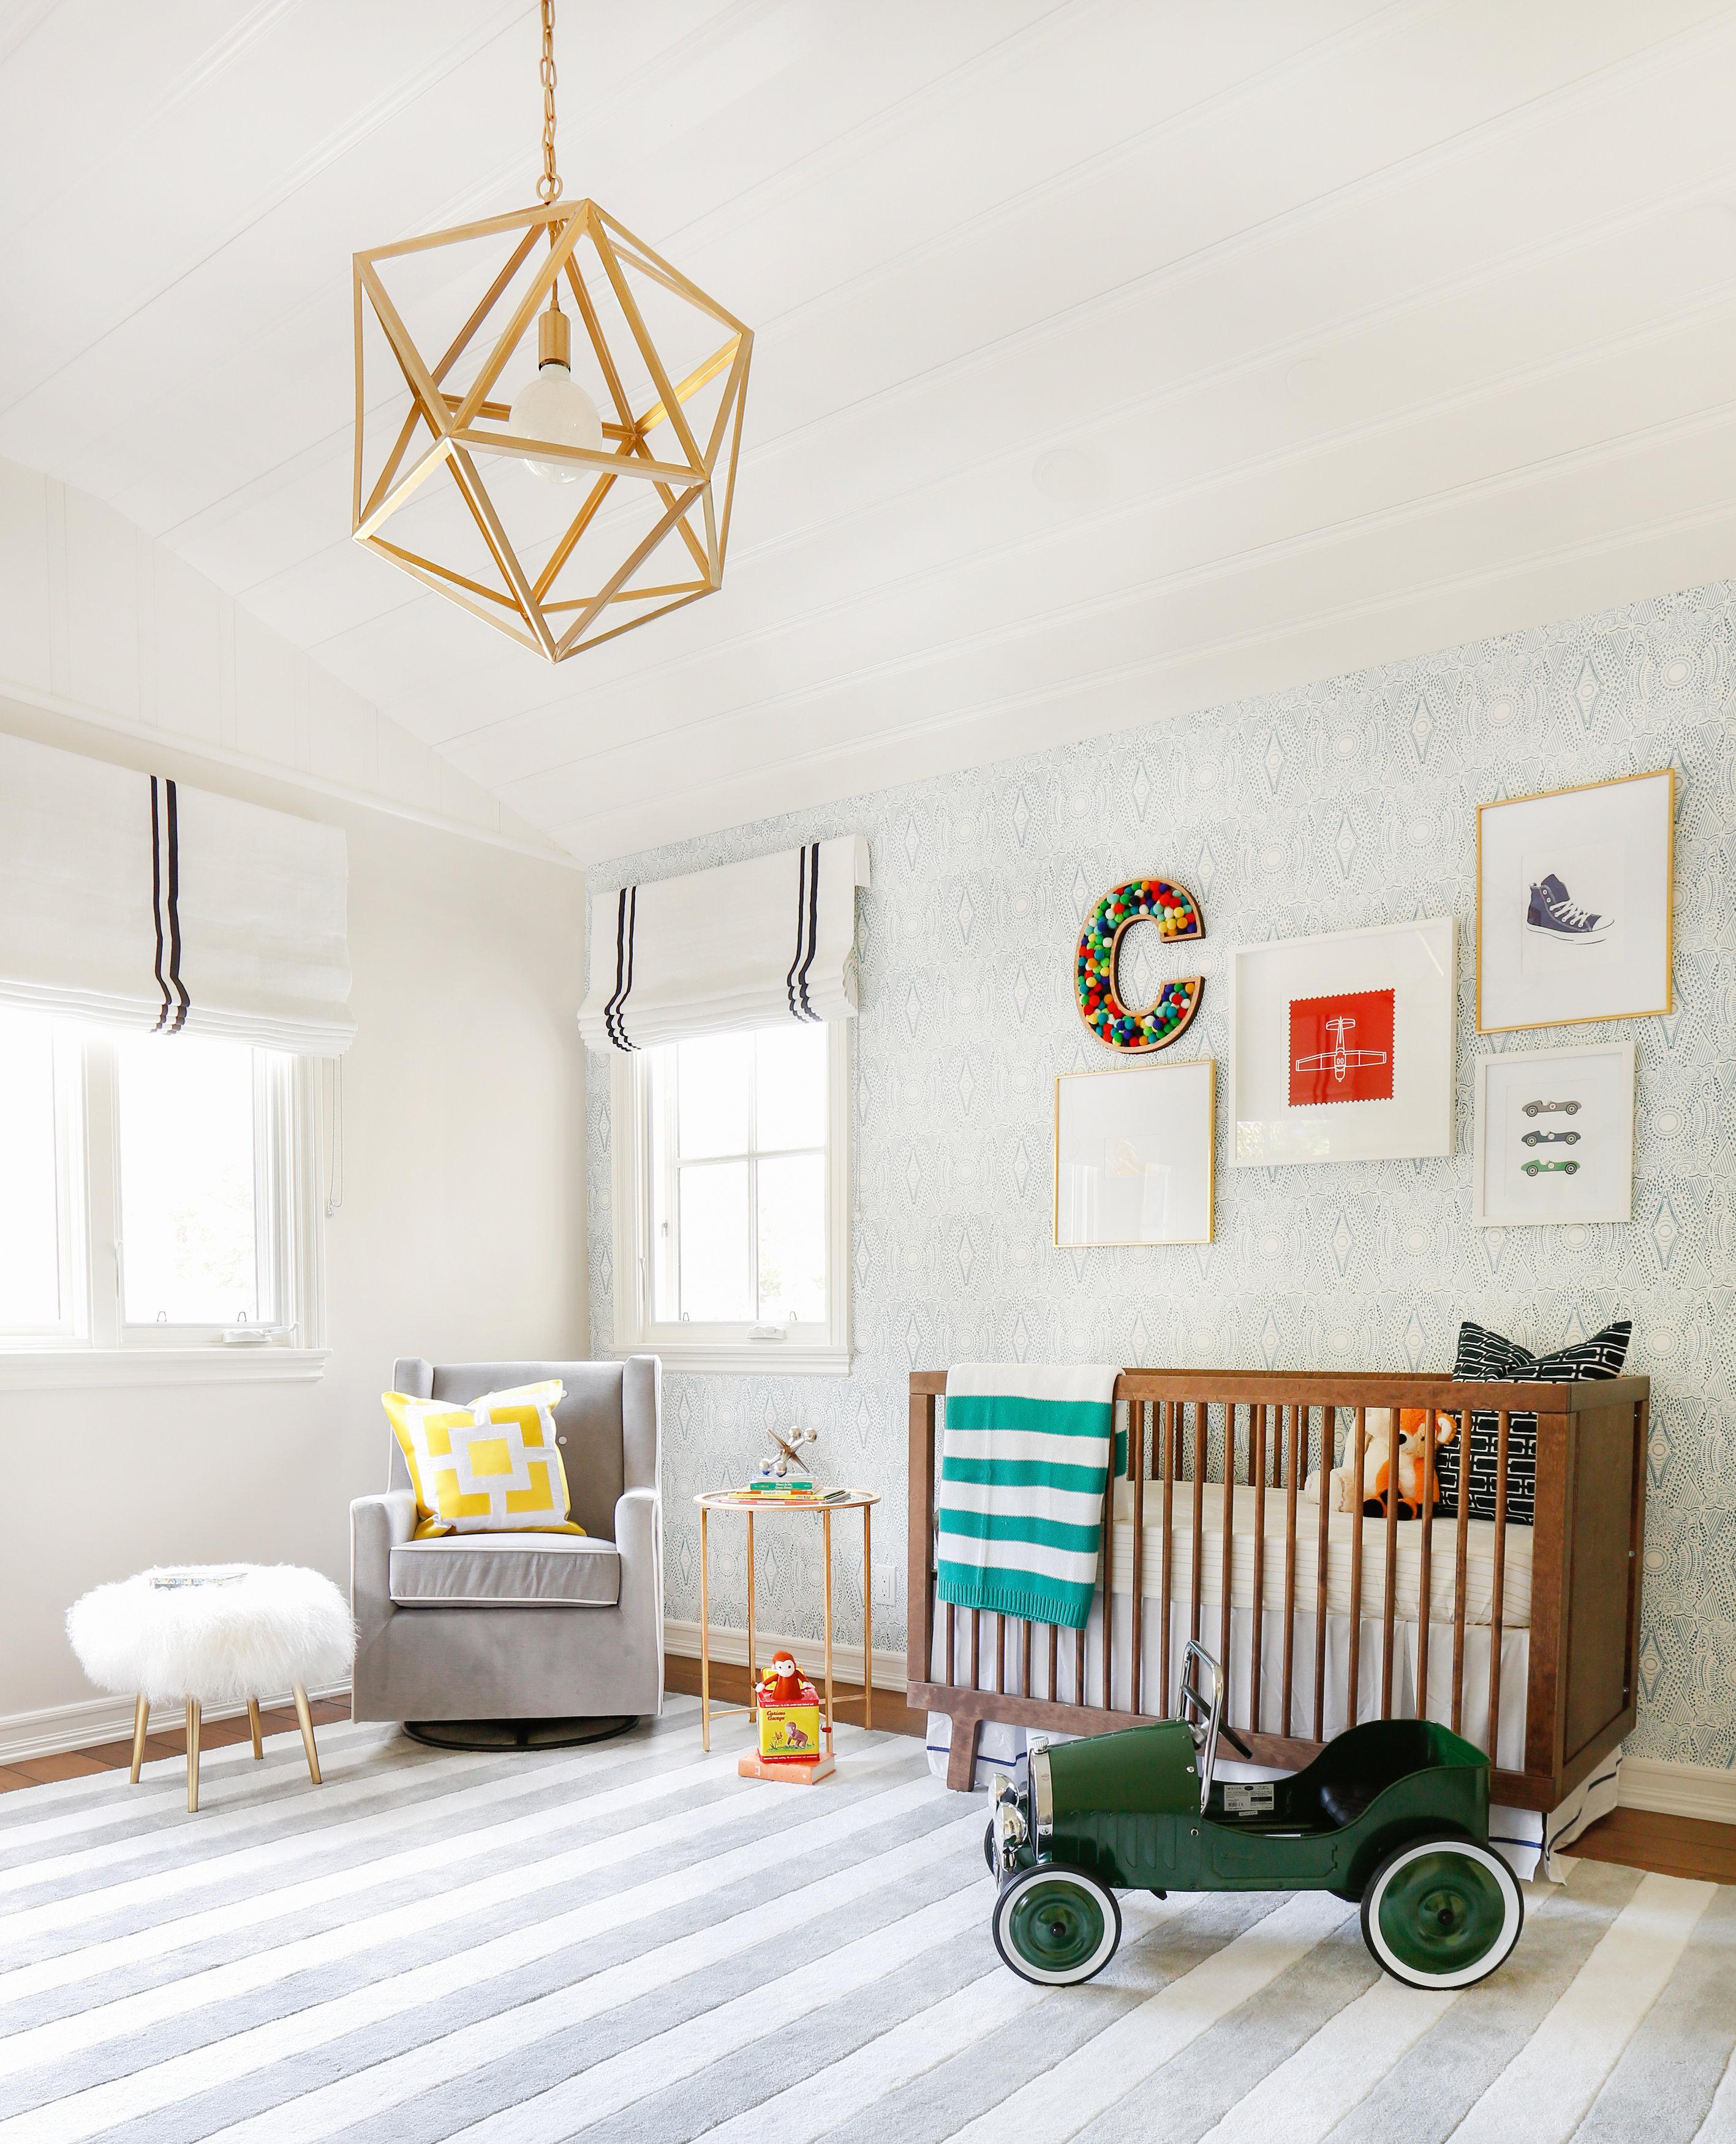 Modern Nursery Ideas: 5 Boys' Room Designs To Inspire You